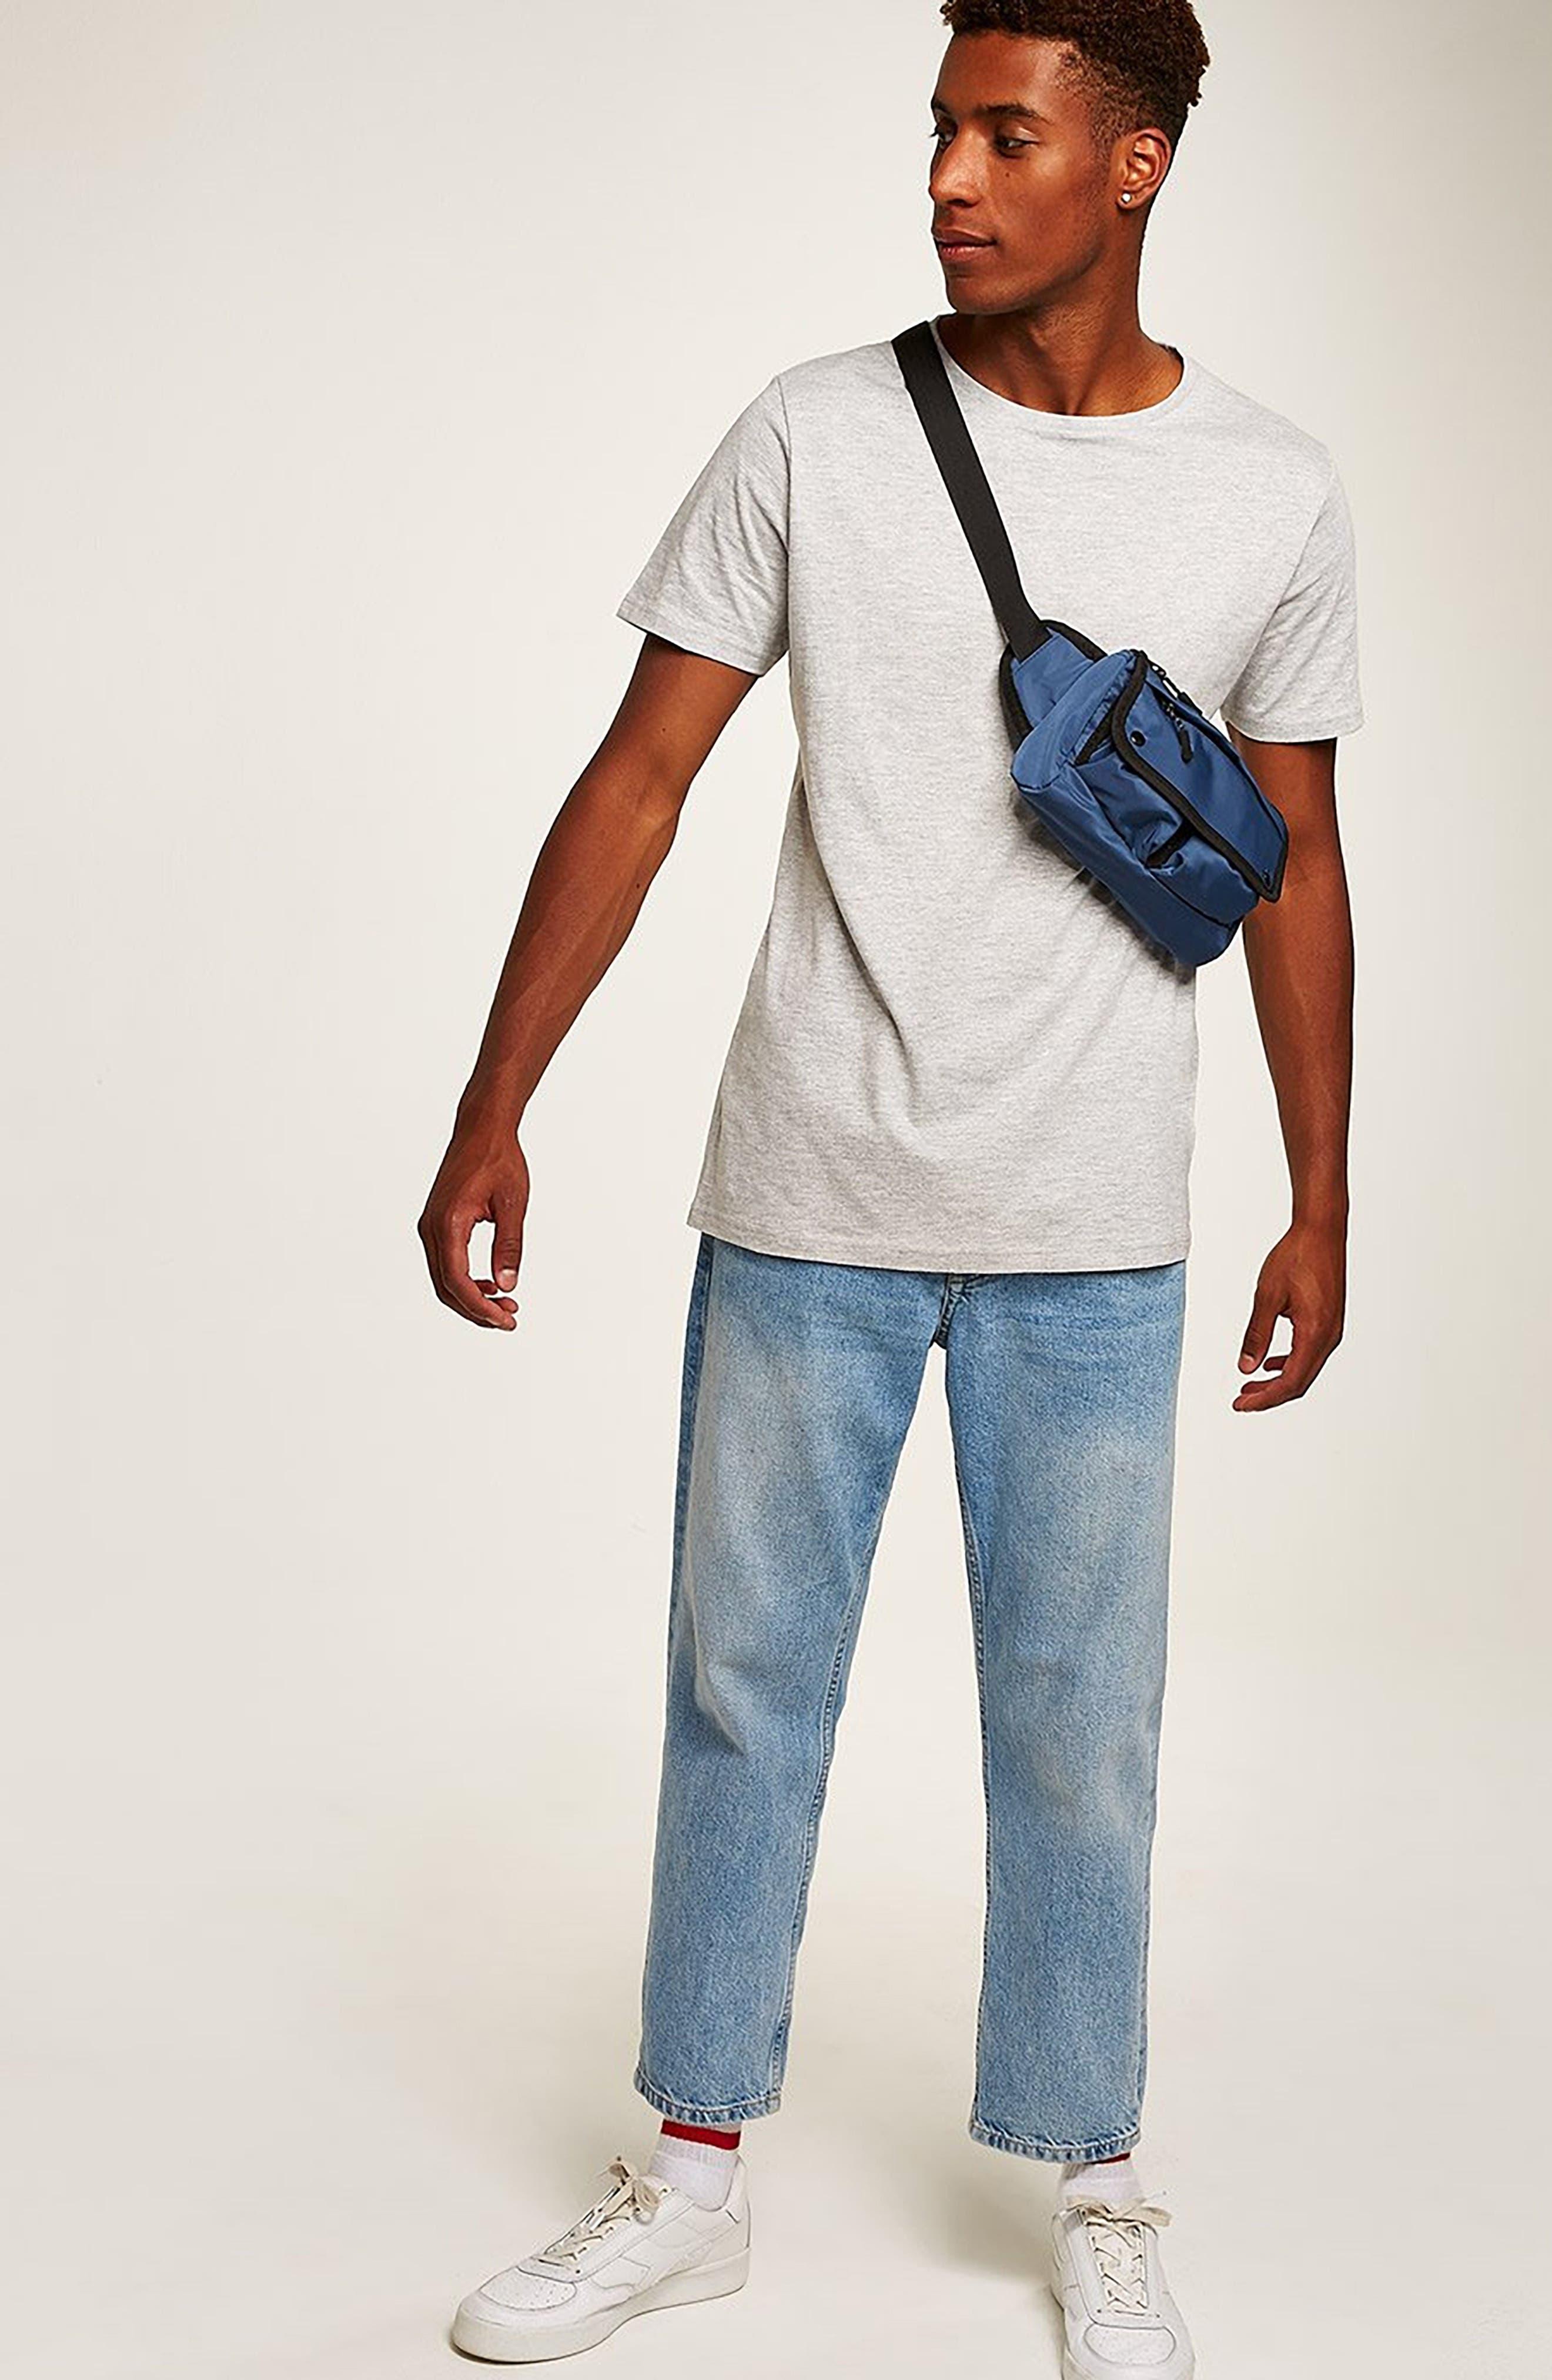 TOPMAN, Longline T-Shirt, Alternate thumbnail 7, color, GREY